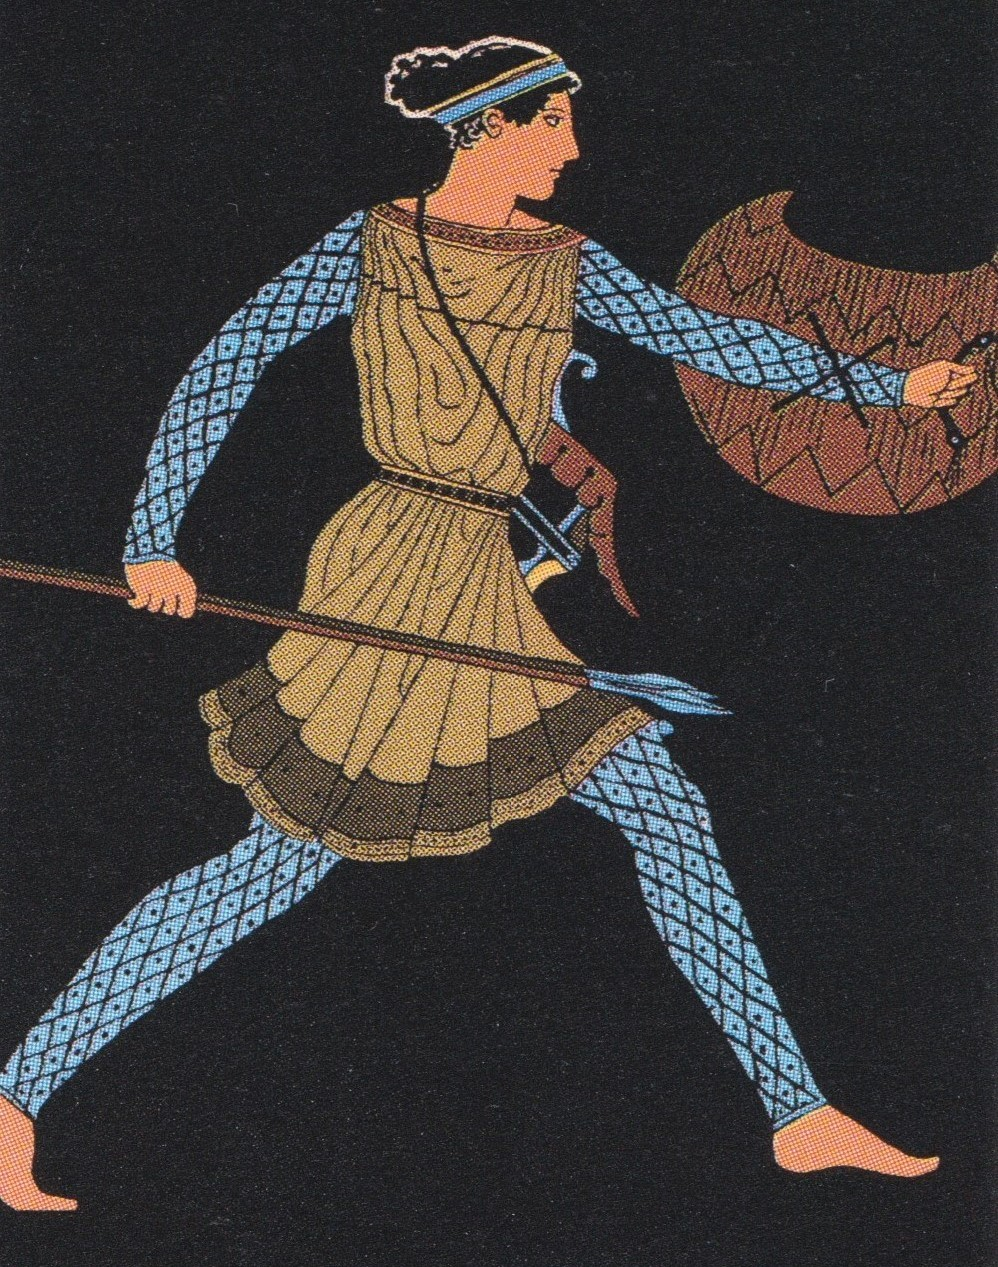 greek mythology gender roles Classical studies: mythology & religion gender-specific ideological interpretations of the roles of female characters in greek mythology.